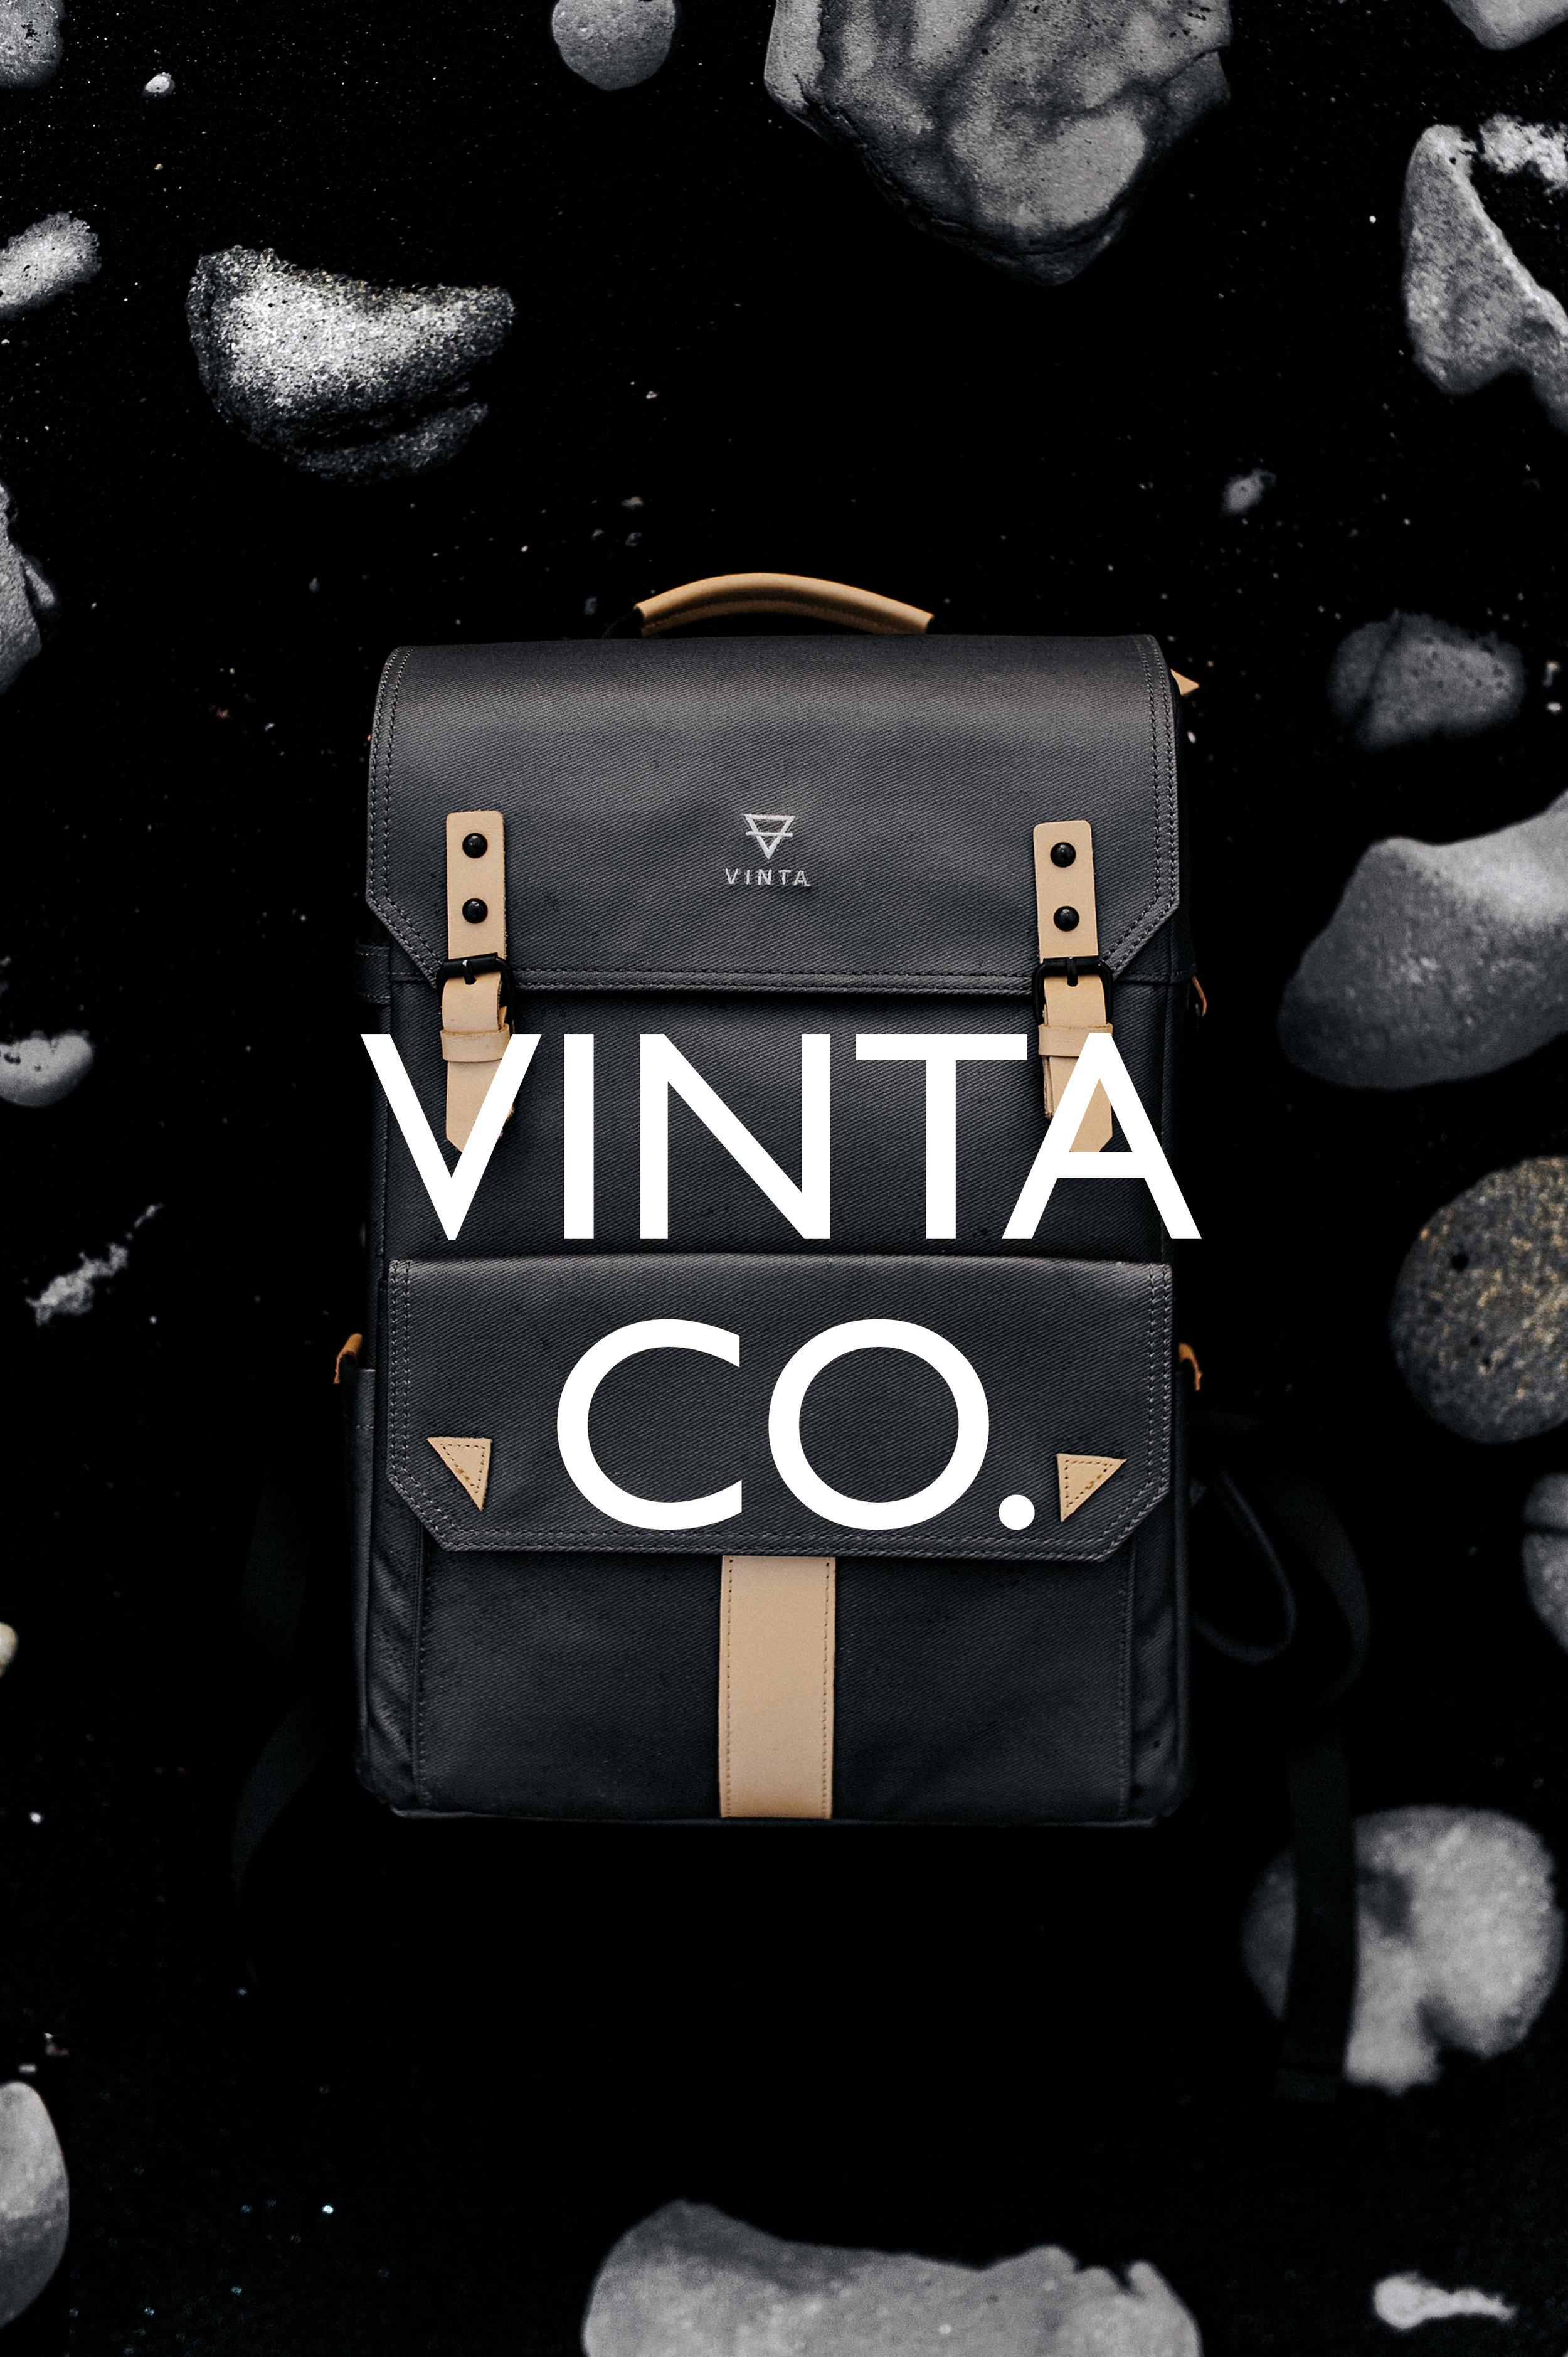 vinta co, vinta, camera bags, vinta camera bags